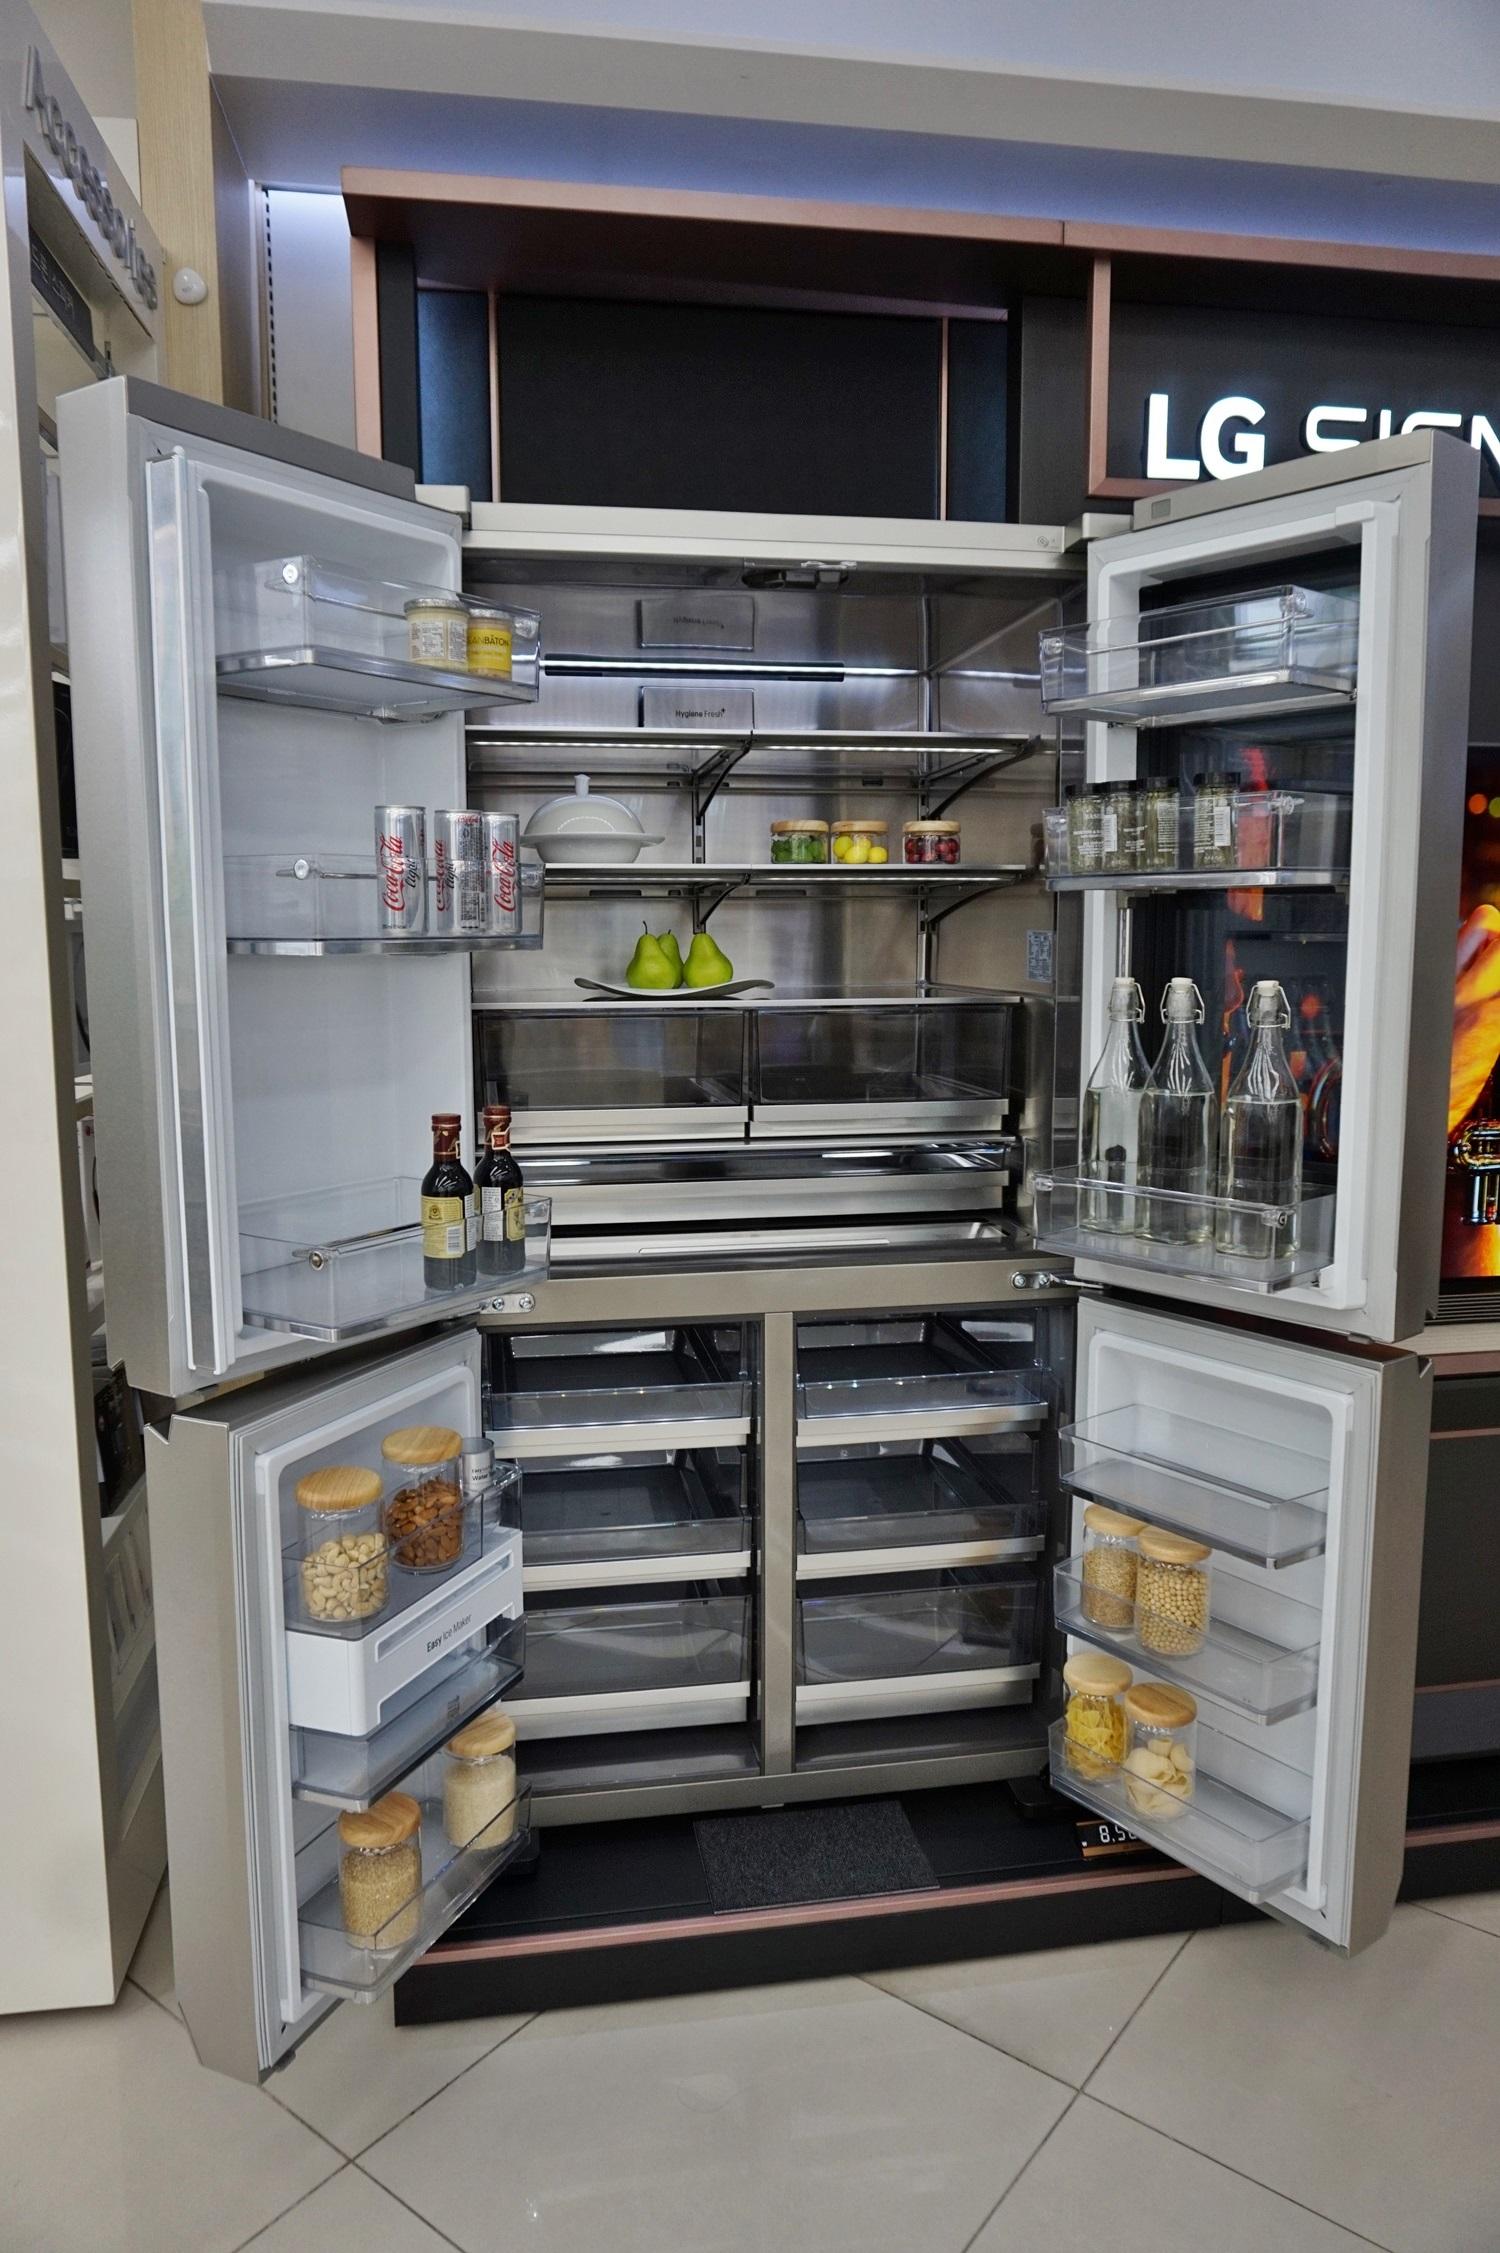 ▲LG 시그니처 냉장고는 내부까지 스테인리스 재질로 제작됐다.